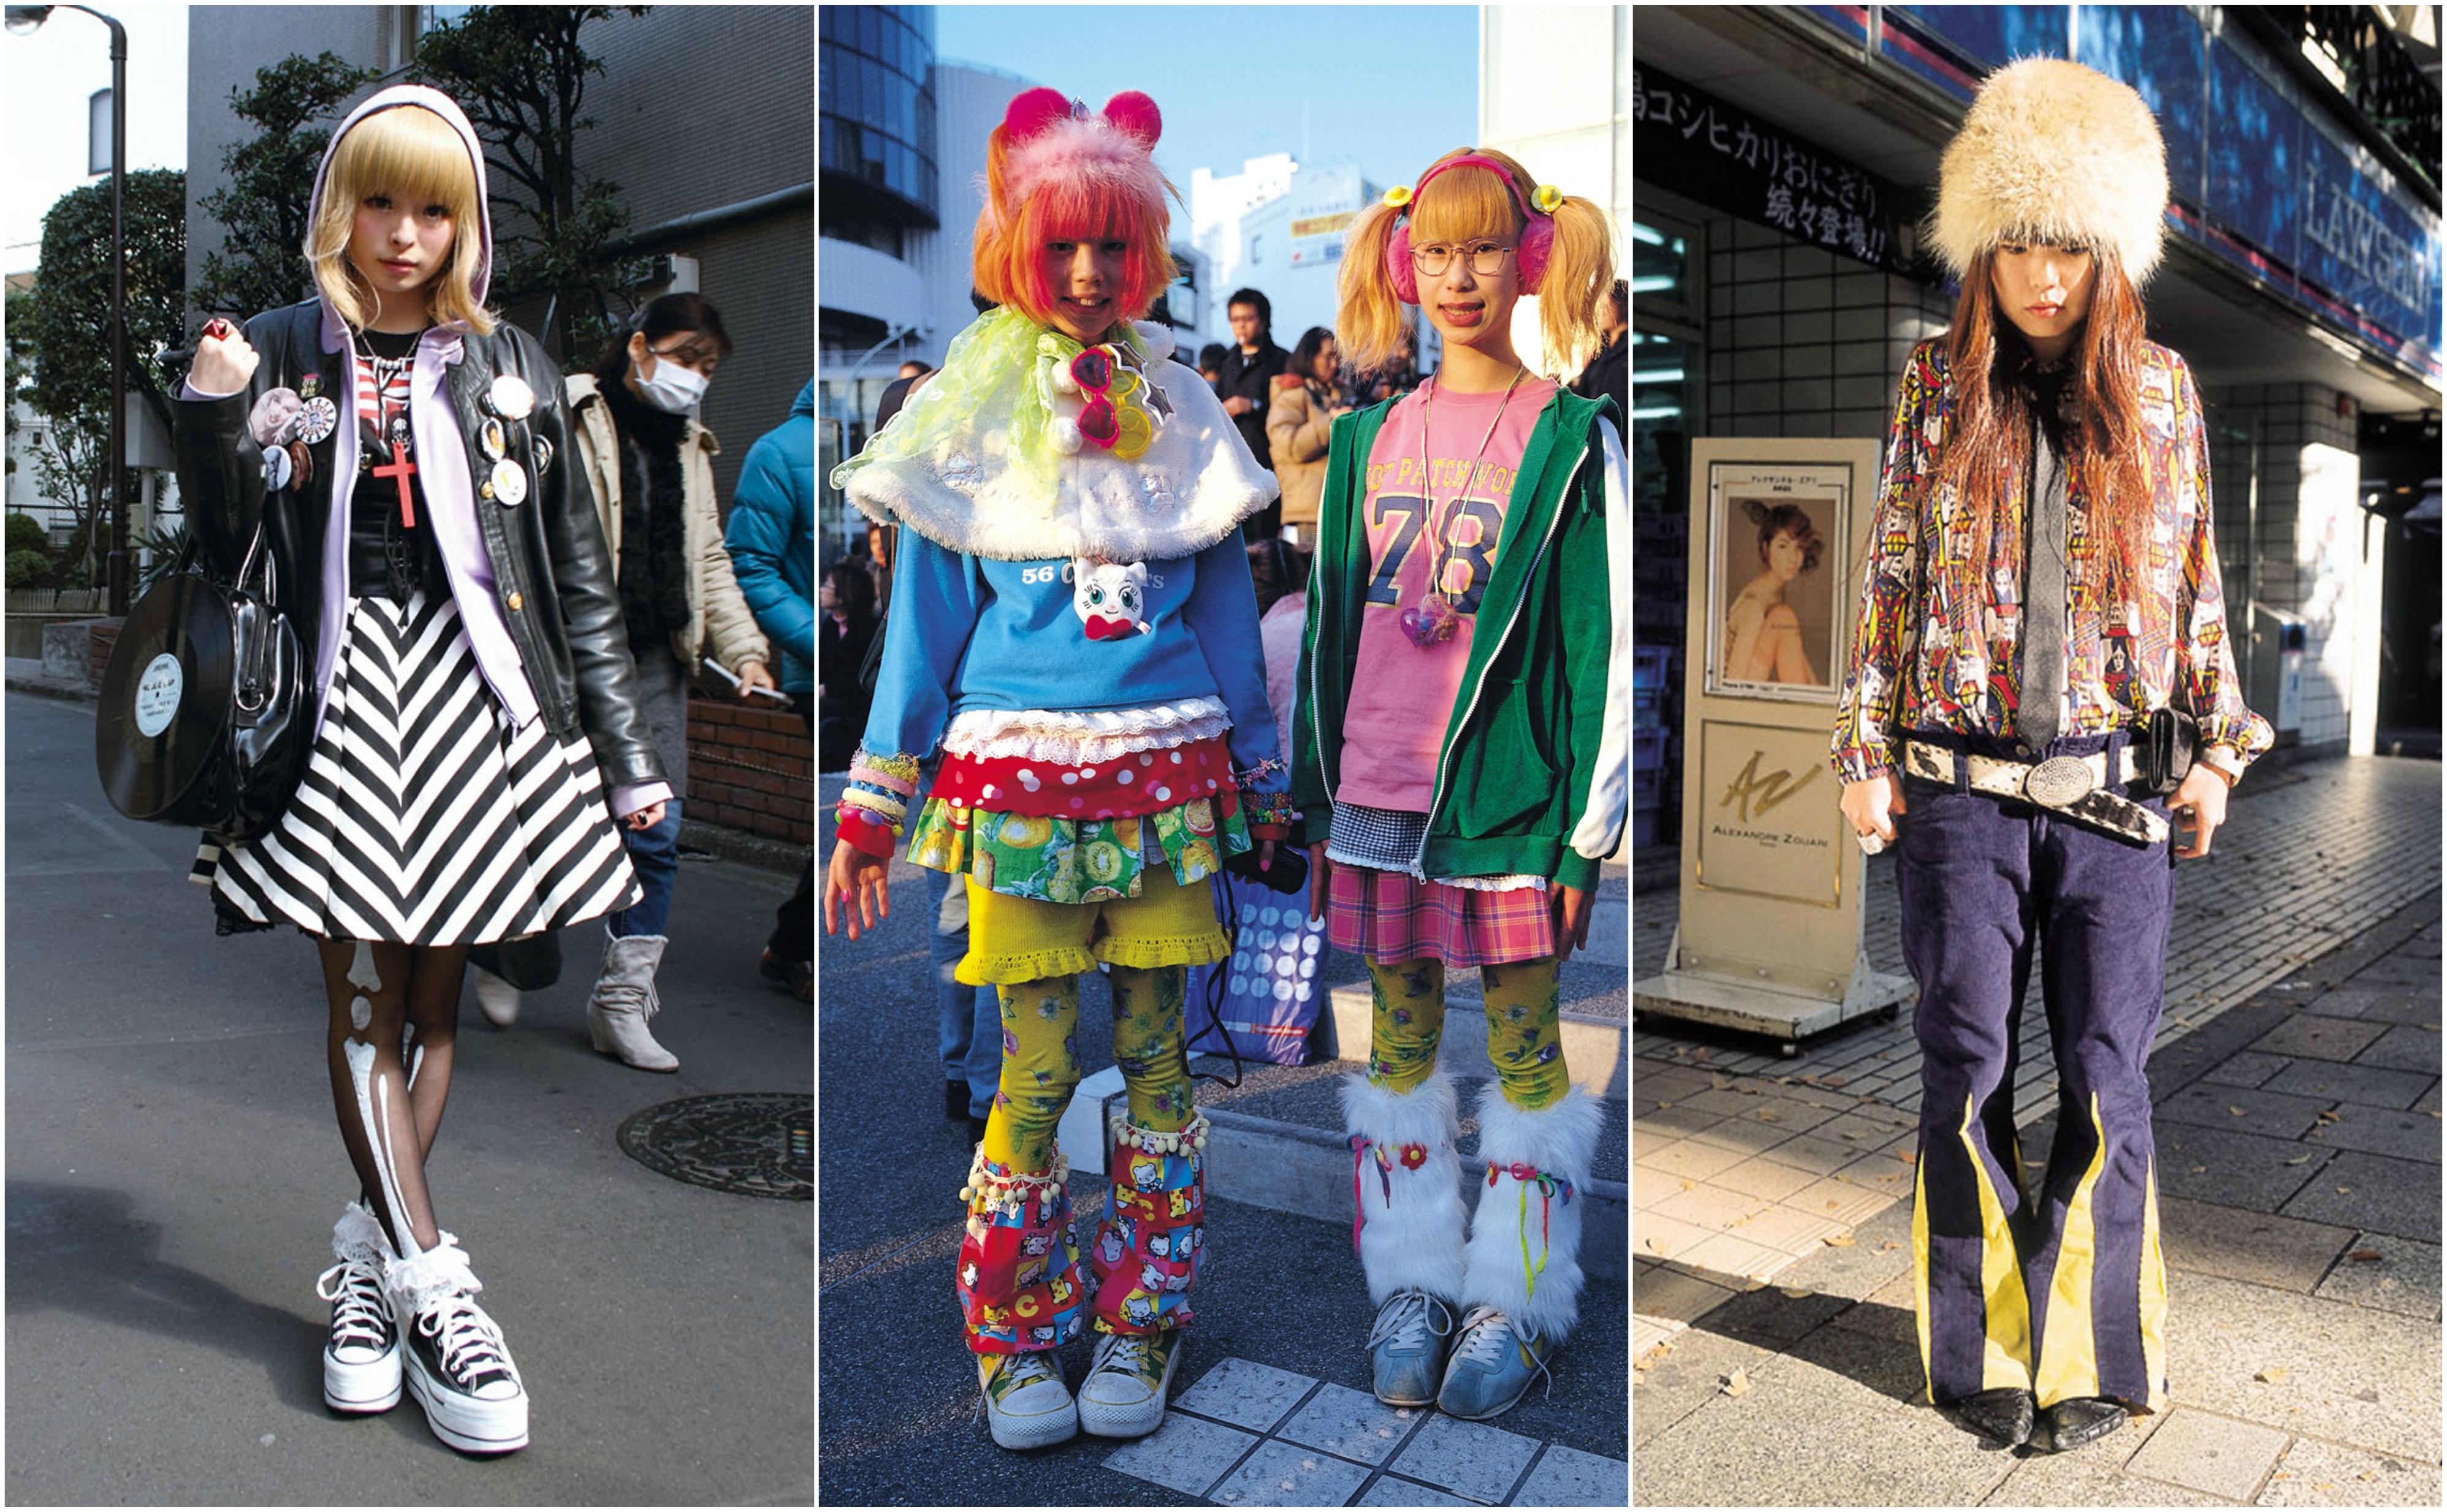 05064aed04 Japan's wild, creative Harajuku street style is dead. Long live ...